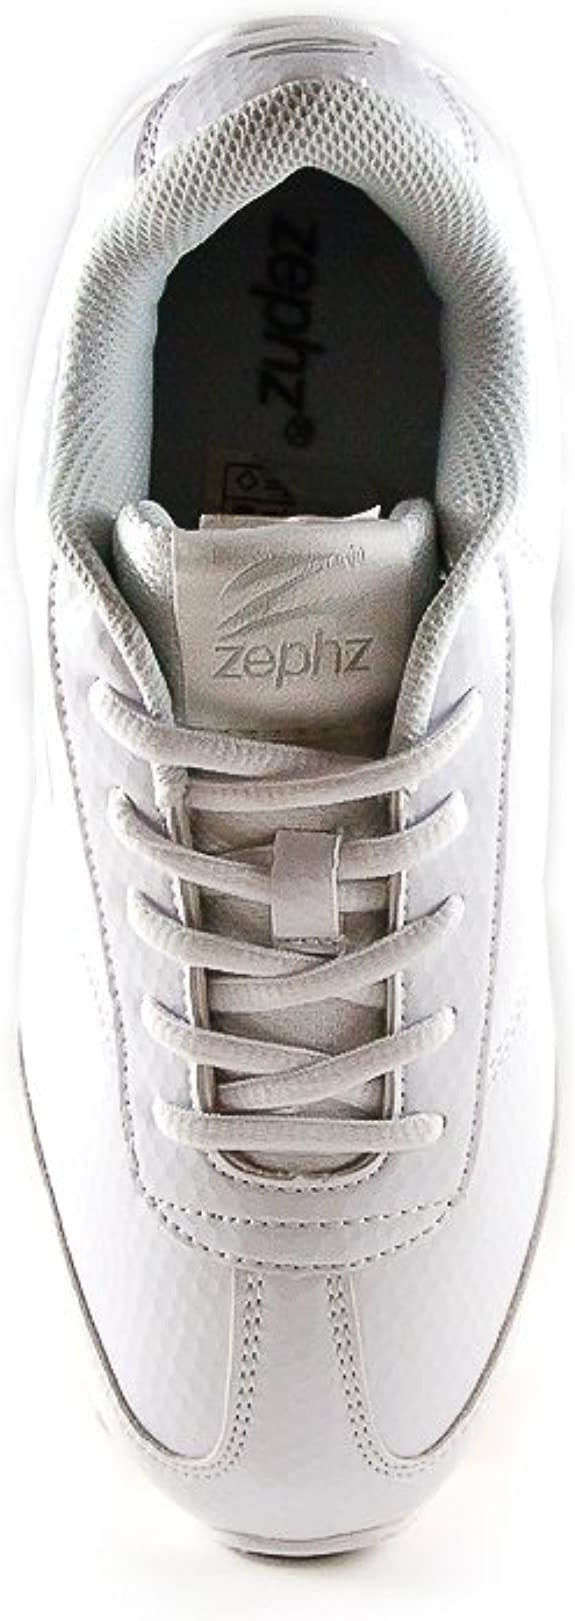 zephz Butterfly 3 Cheerleading Shoe Youth